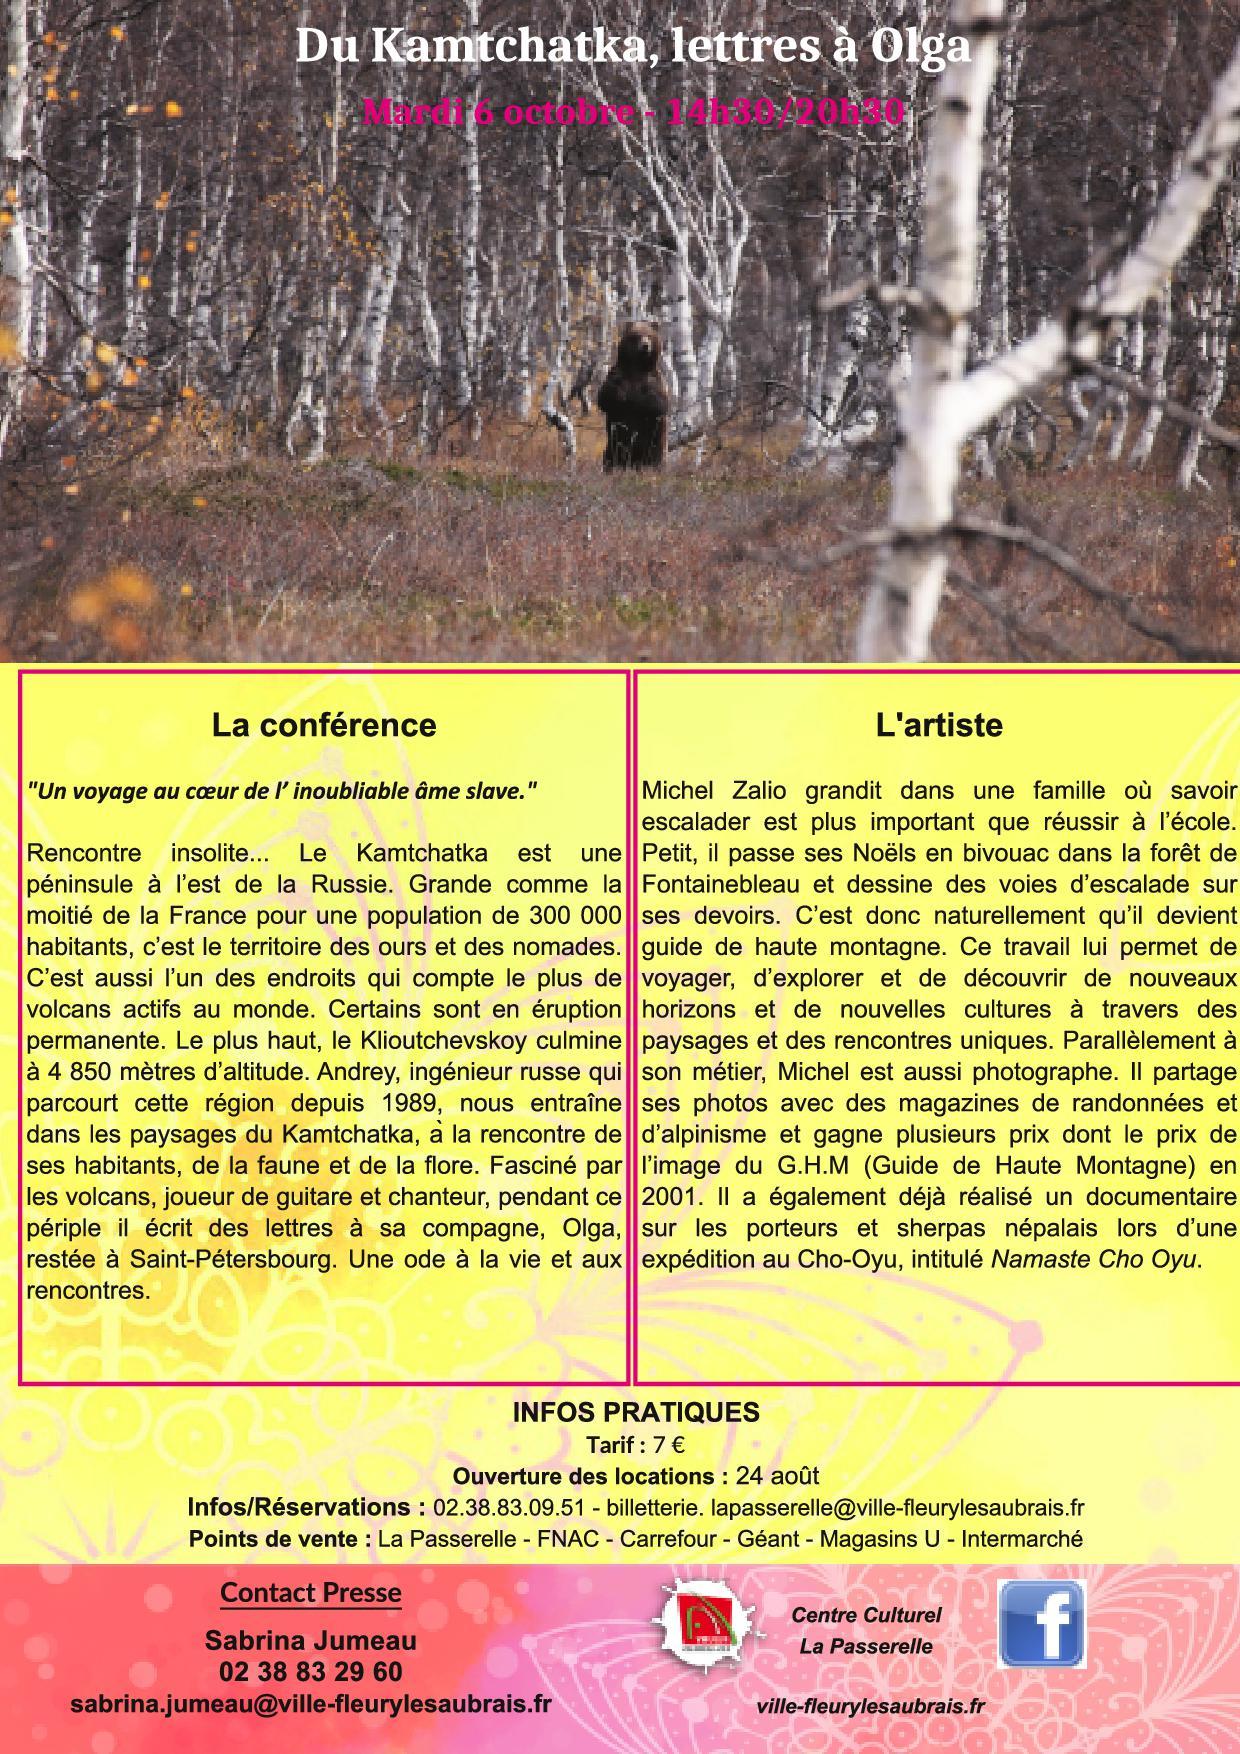 Du Kamtchatka lettres à Olga - 6 octobre.jpg